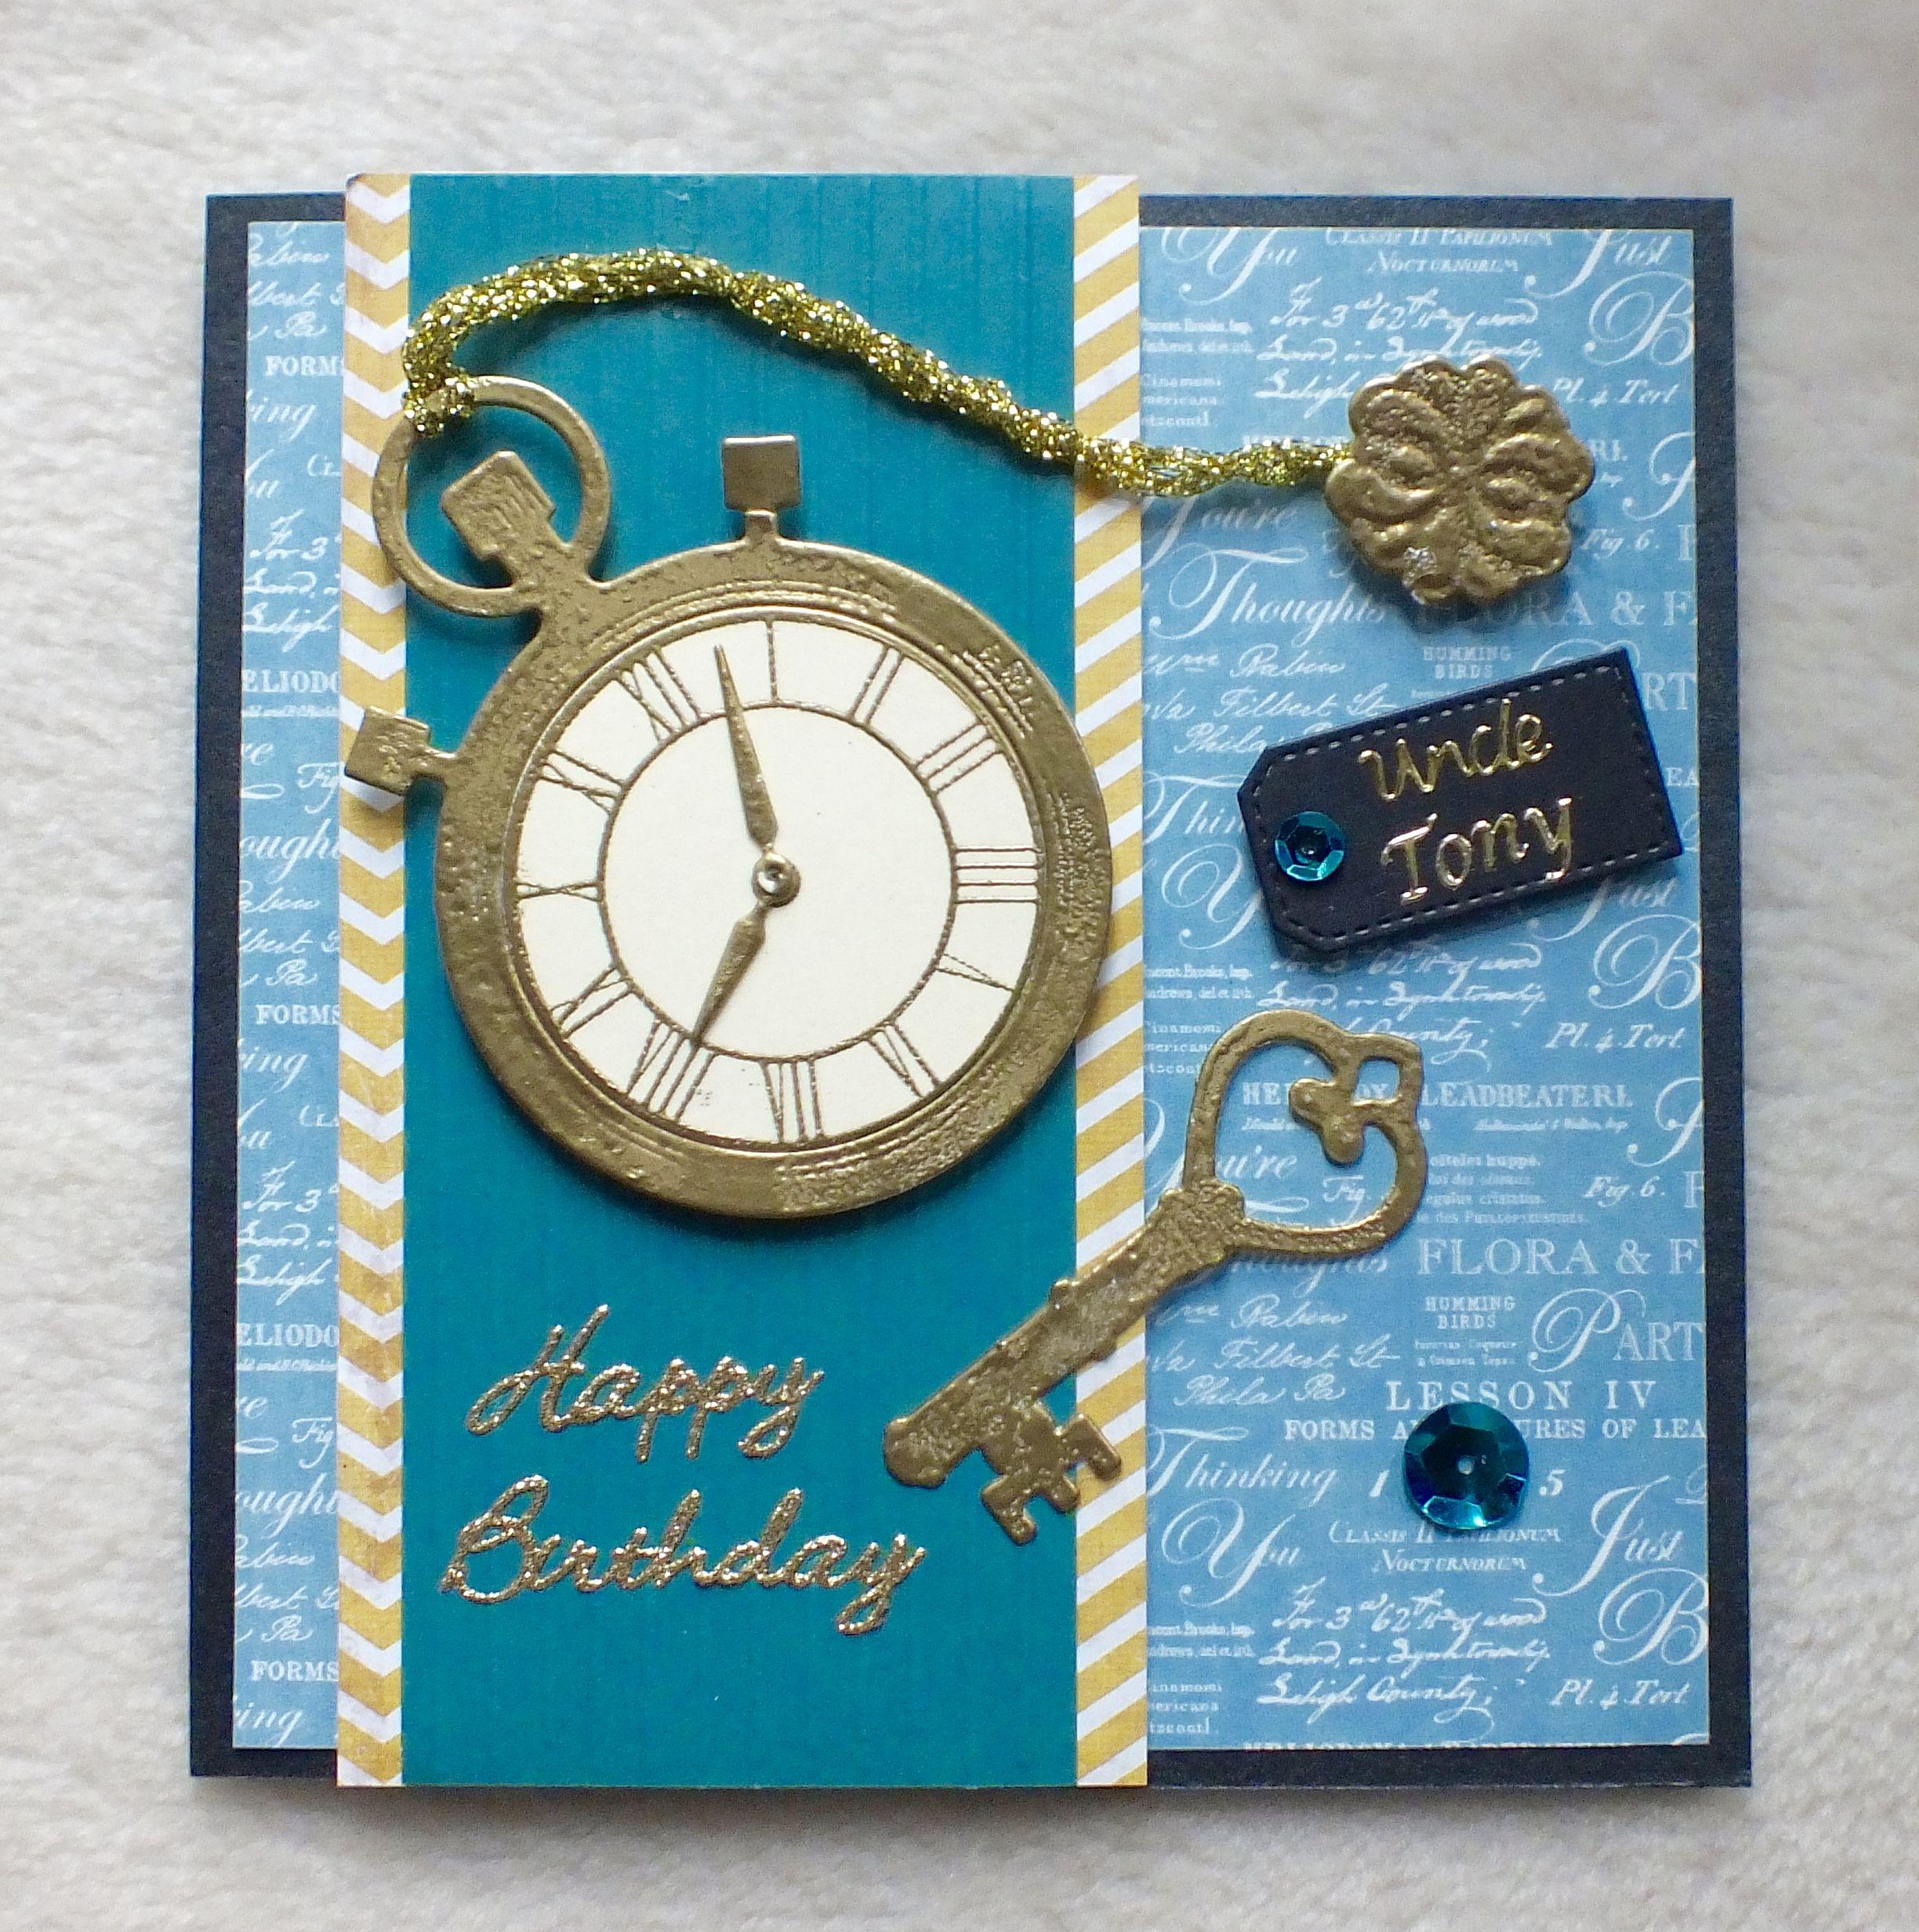 Pin By Gagan Sampla On Clocks: Pocket Watch, Die Cut And Heat Embossed, Birthday Card